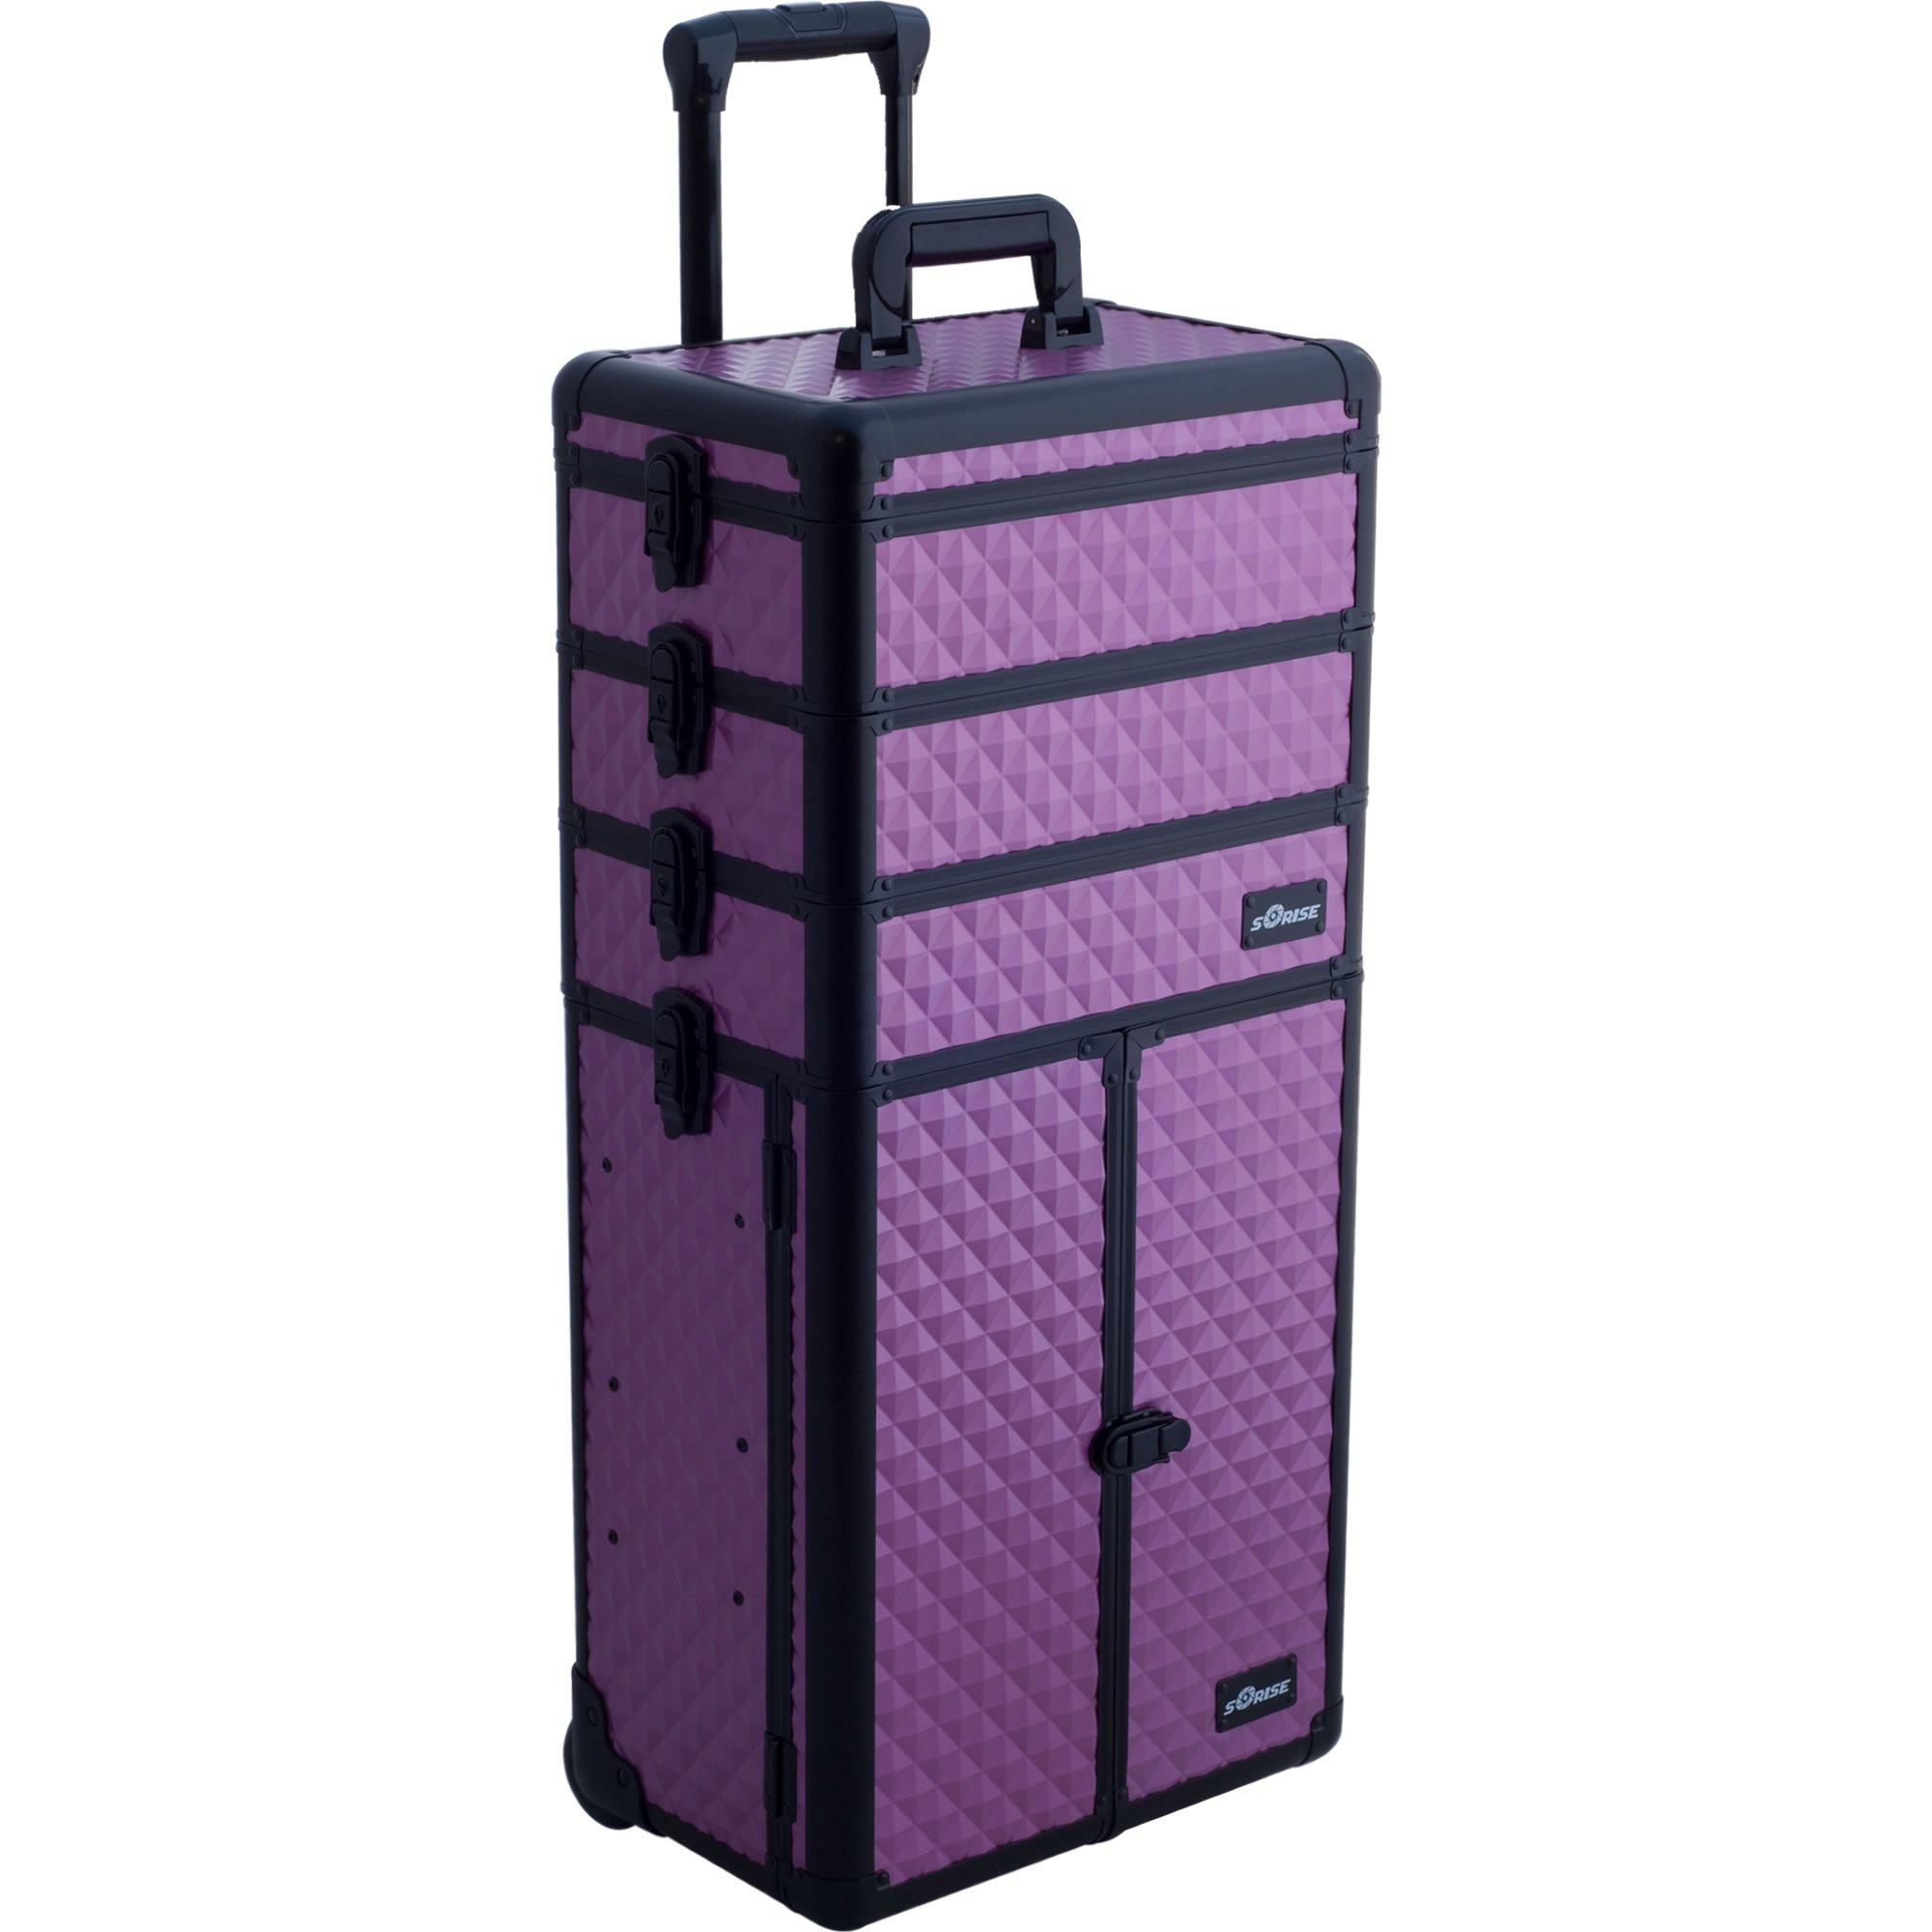 Sunrise Colonne 2-In-1 Rolling Makeup Case Professional Nail Travel Organizer Box, Purple Diamond, 25 Pound